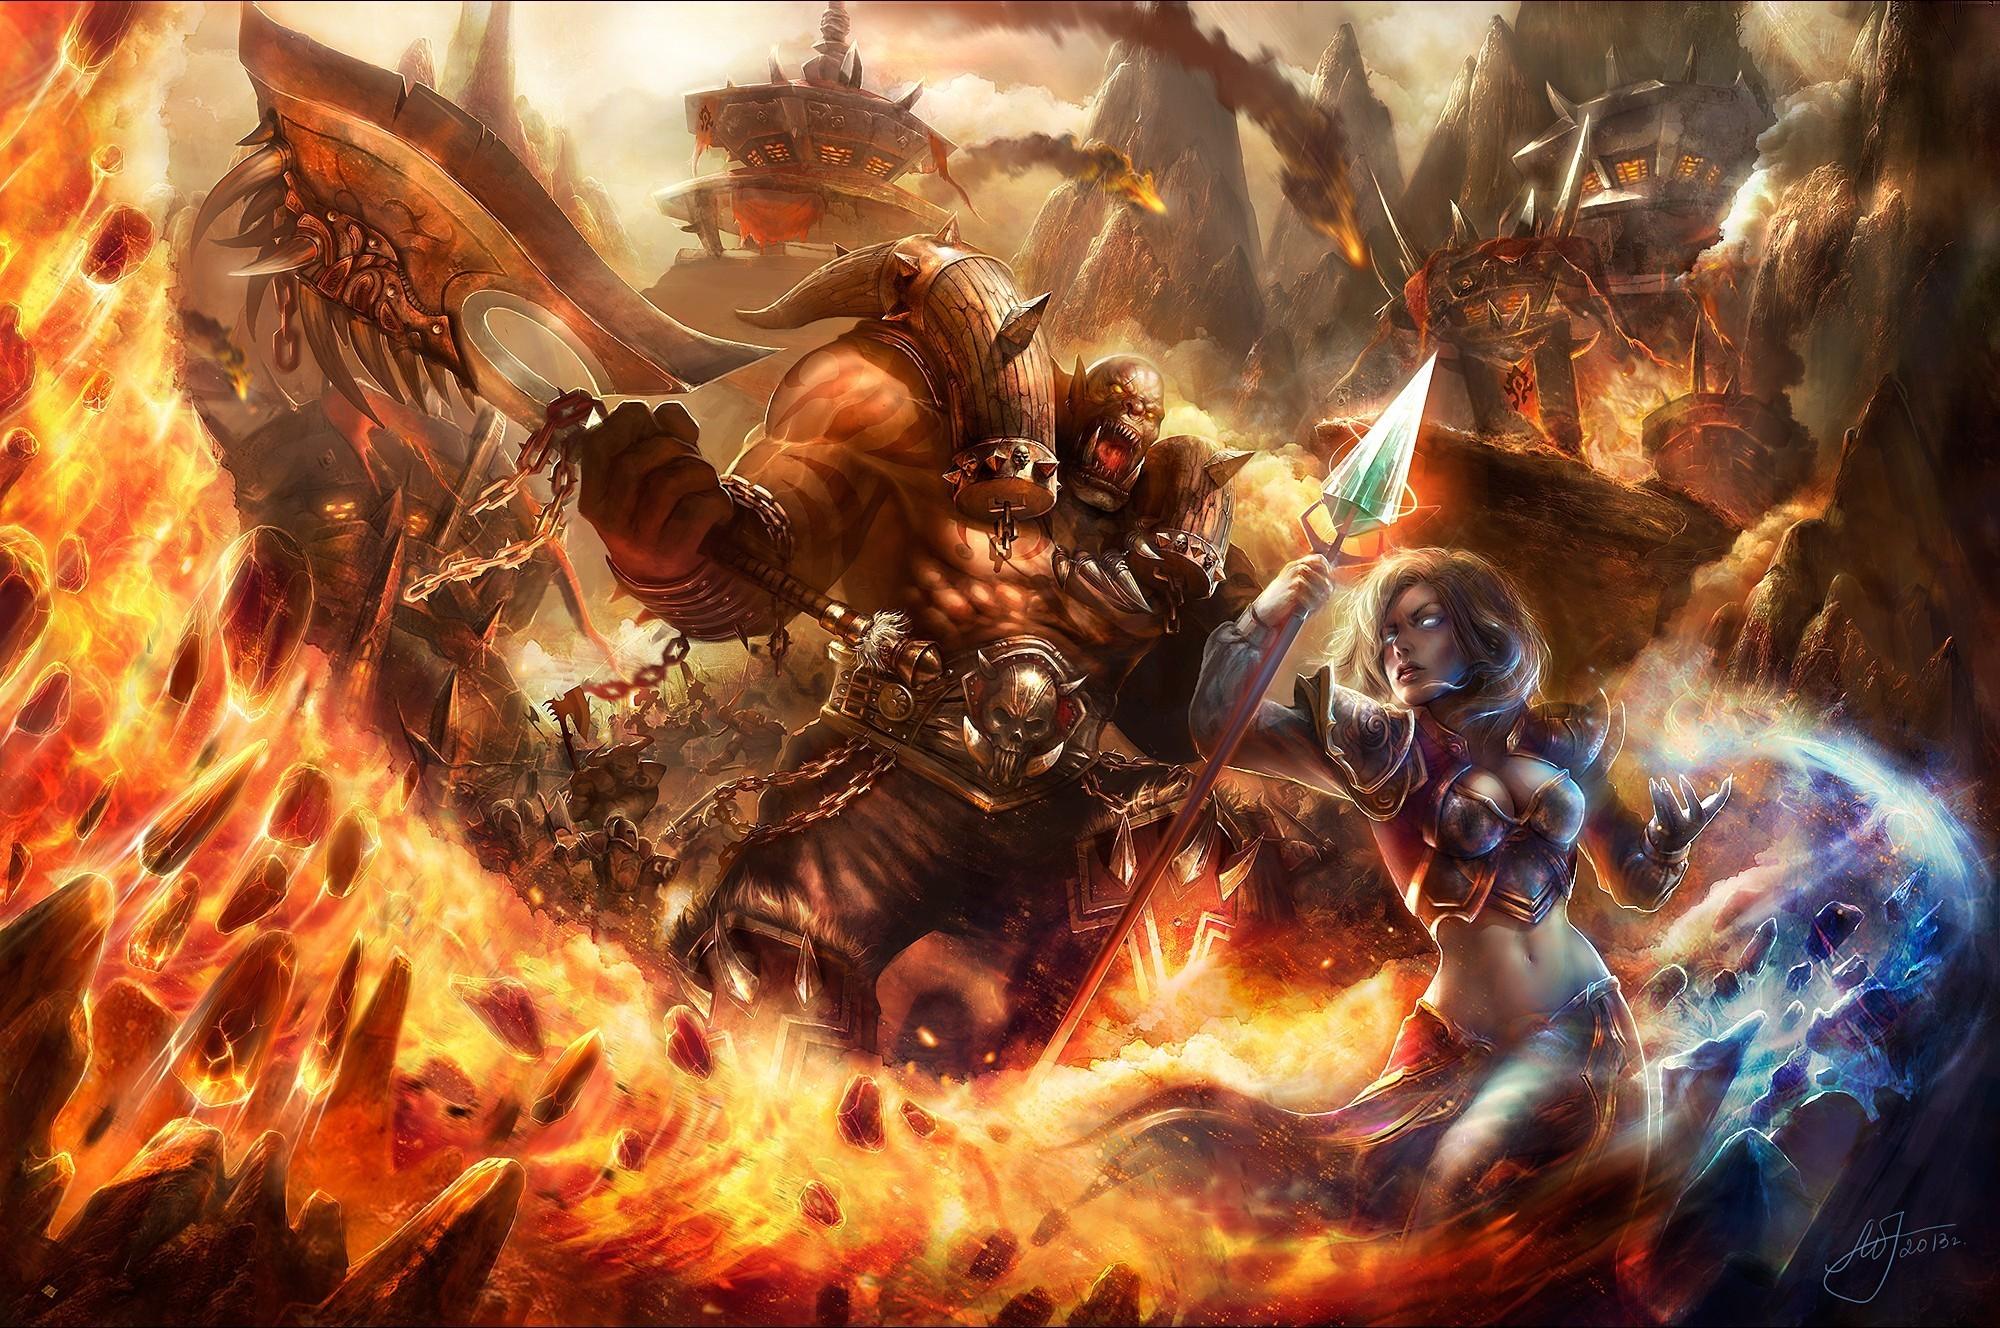 General 2000x1328 video games artwork World of Warcraft Jaina Proudmoore Garrosh Helscream